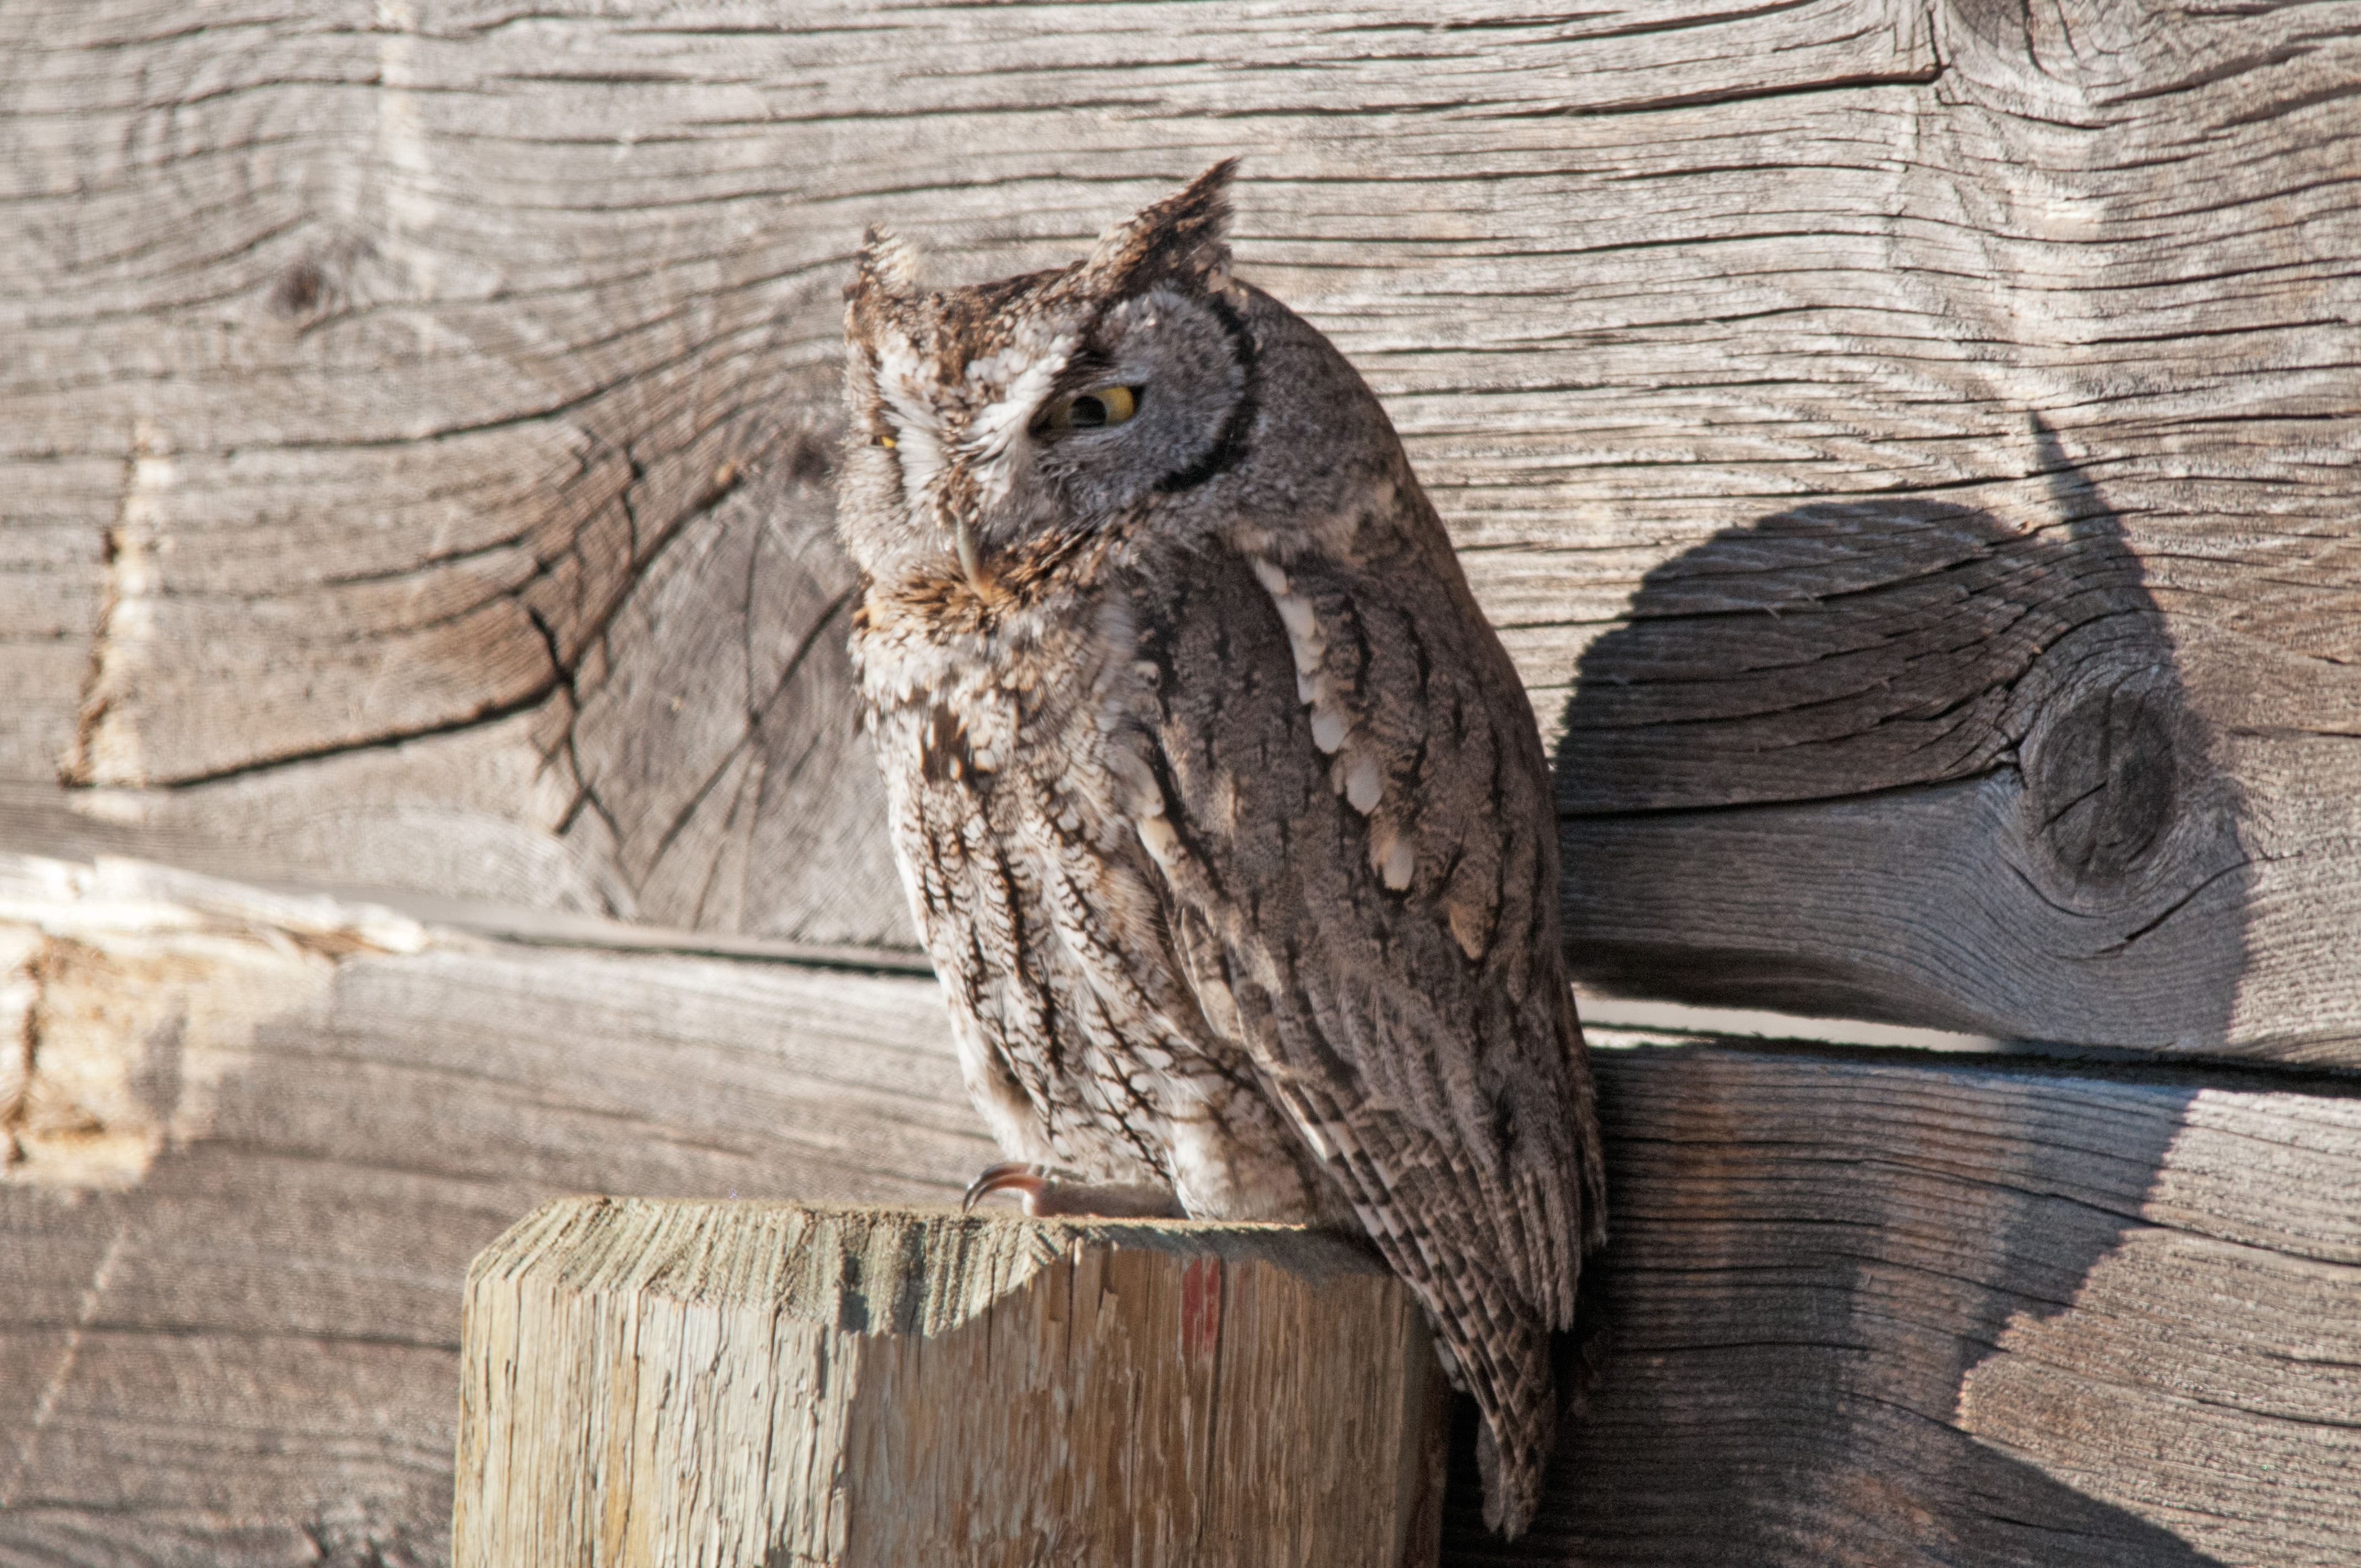 Western-Screech Owl 010216 B.jpg